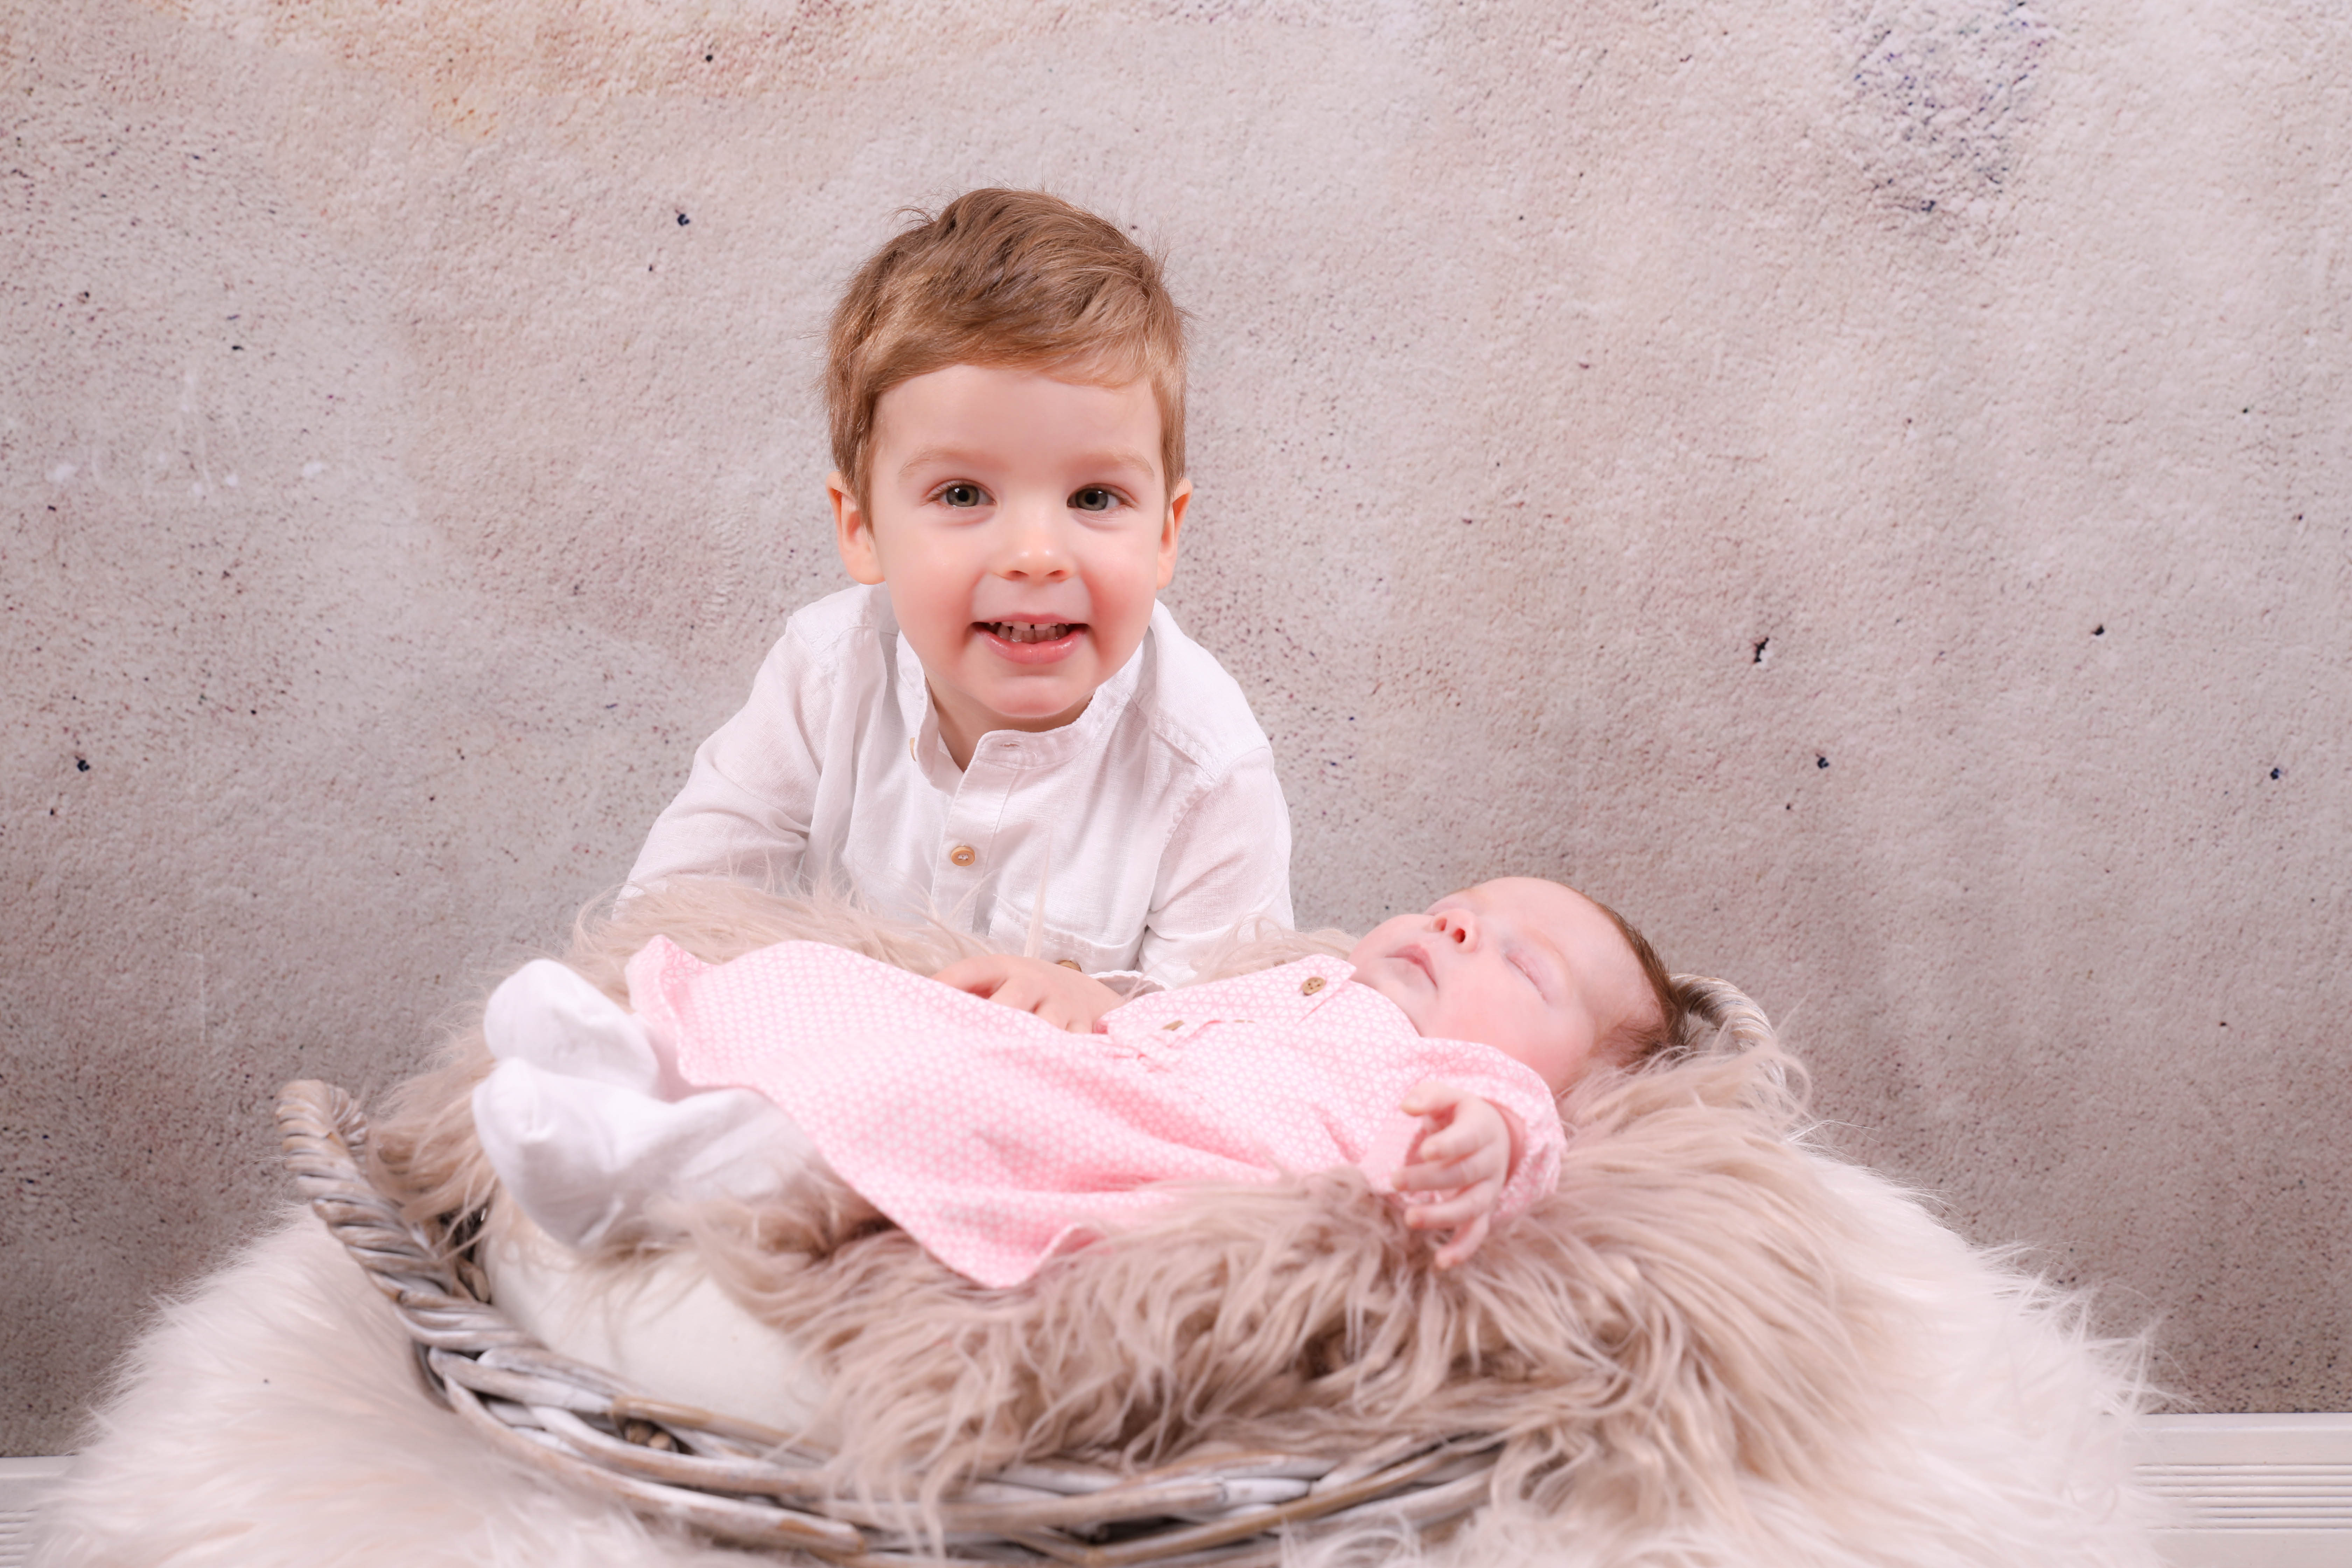 ArtbyClaire Newborn Photography, Hemel Hempstead, Hertfordshire